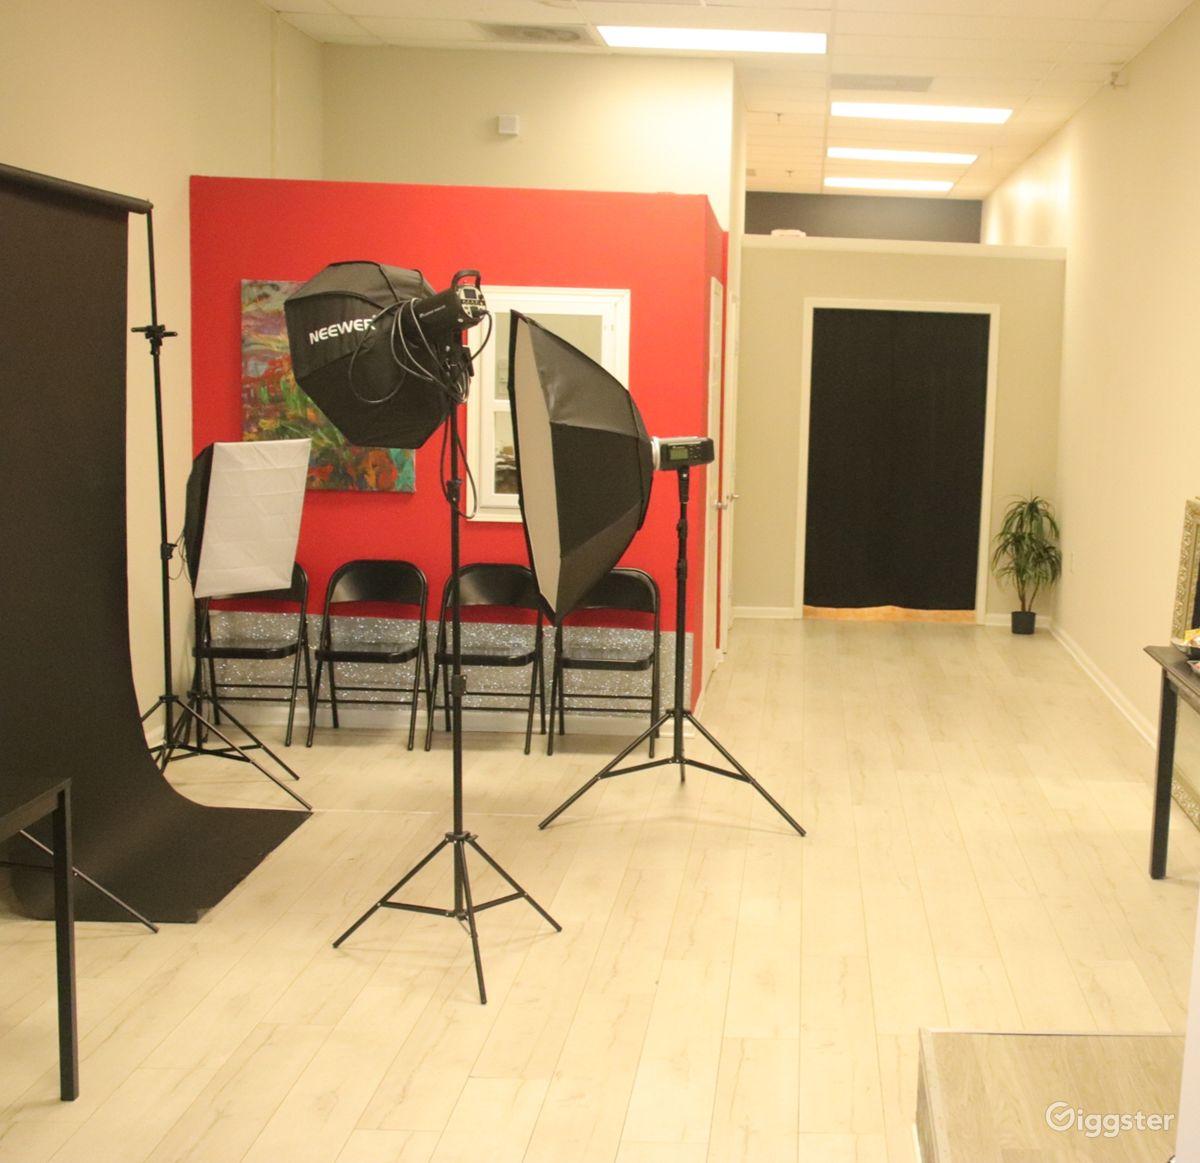 Decatur Studio For Photo Shoots, Castings, Podcast